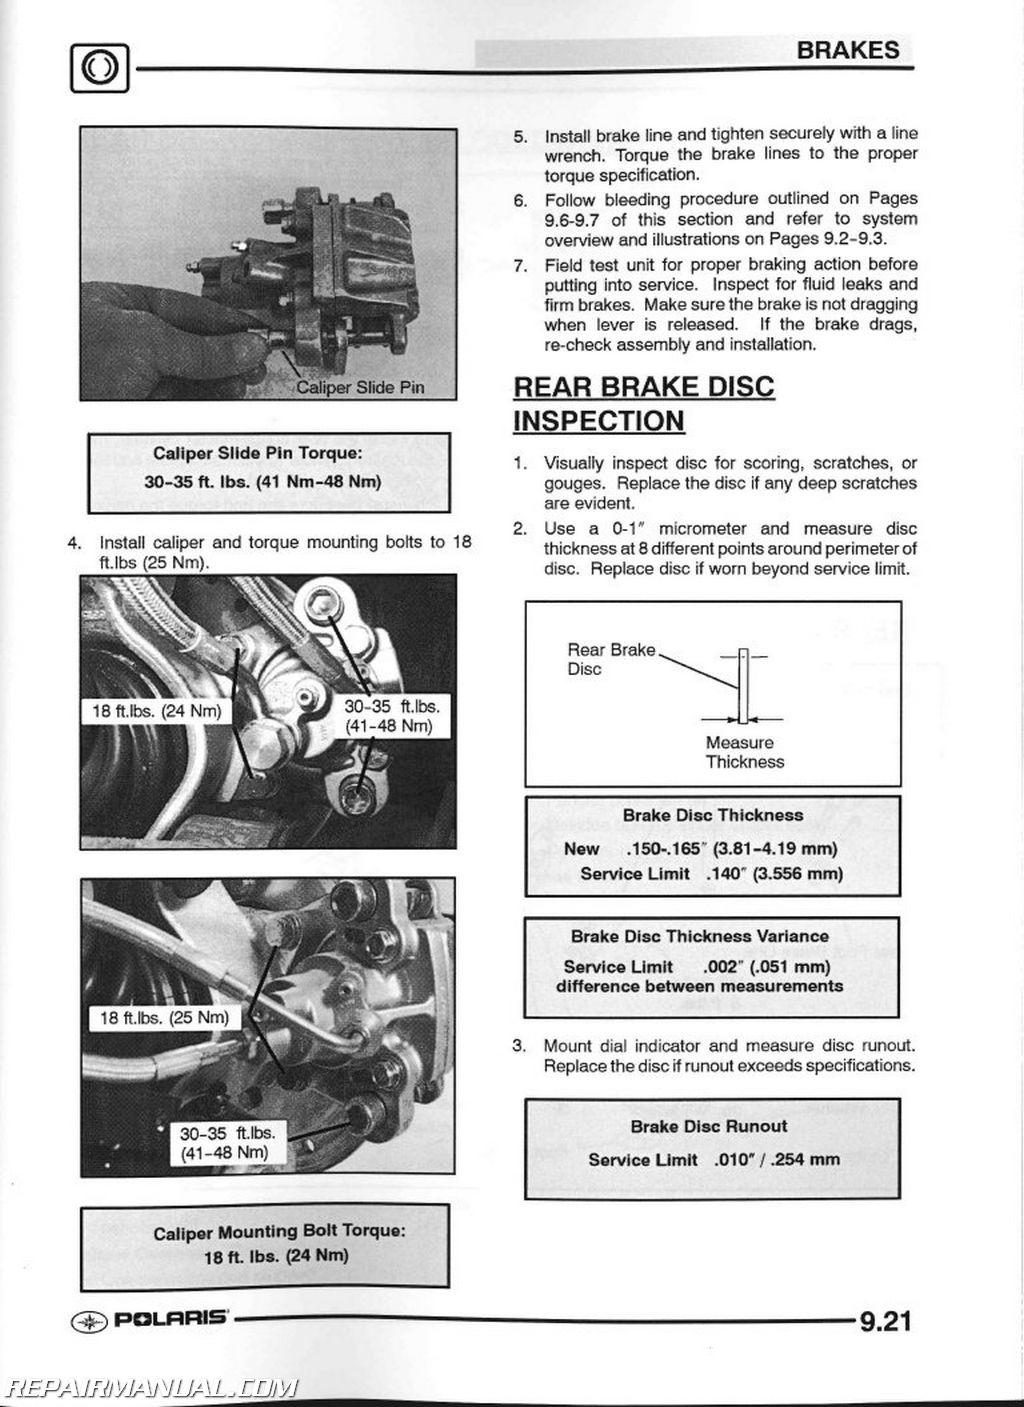 polaris sportsman 800 service manual